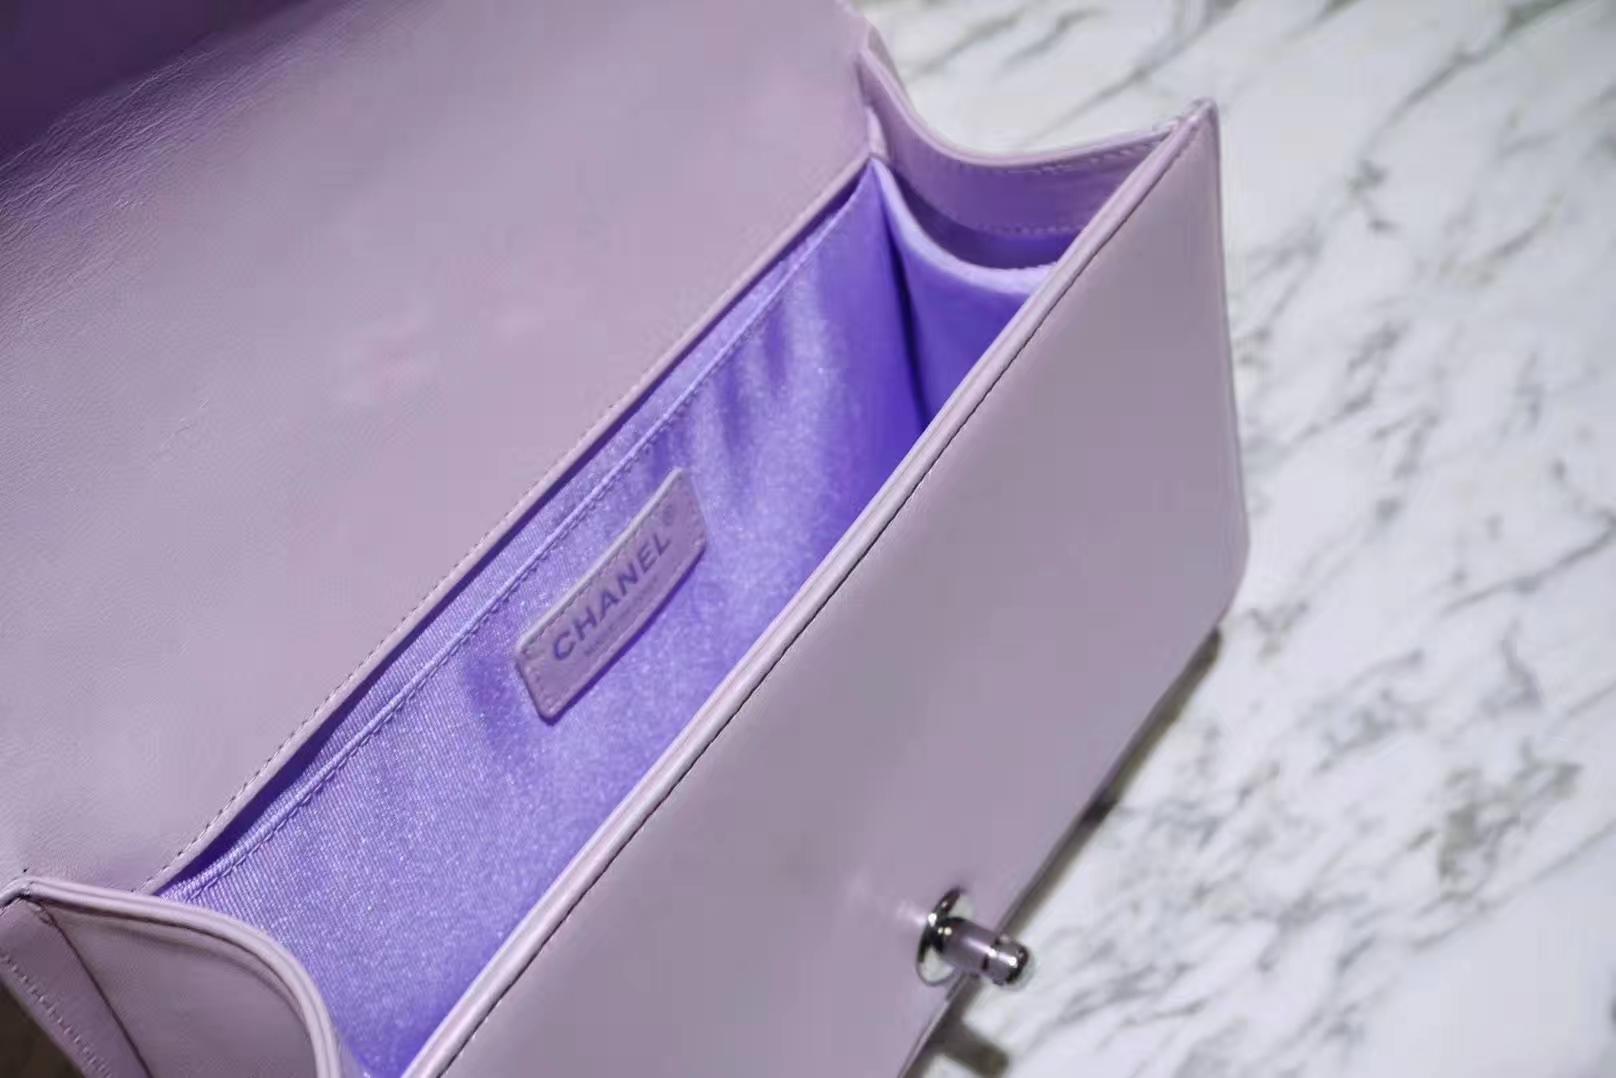 Chanel 香奈儿 Leboy系列 25cm 原厂小羊皮 珠光粉色 大理石纹琉璃五金